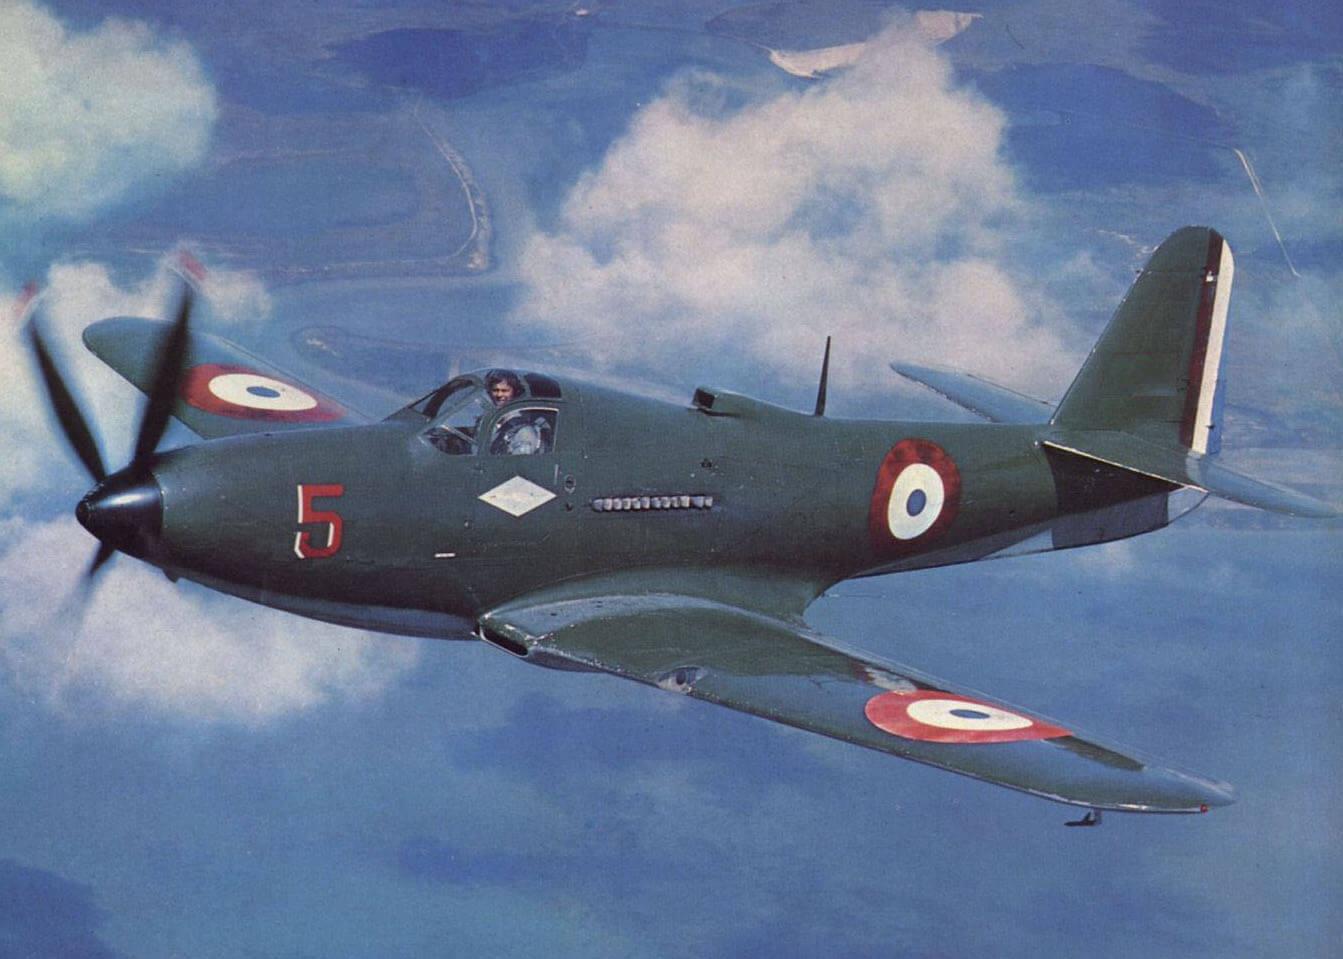 Flight Manual for the Bell P-63 Kingcobra